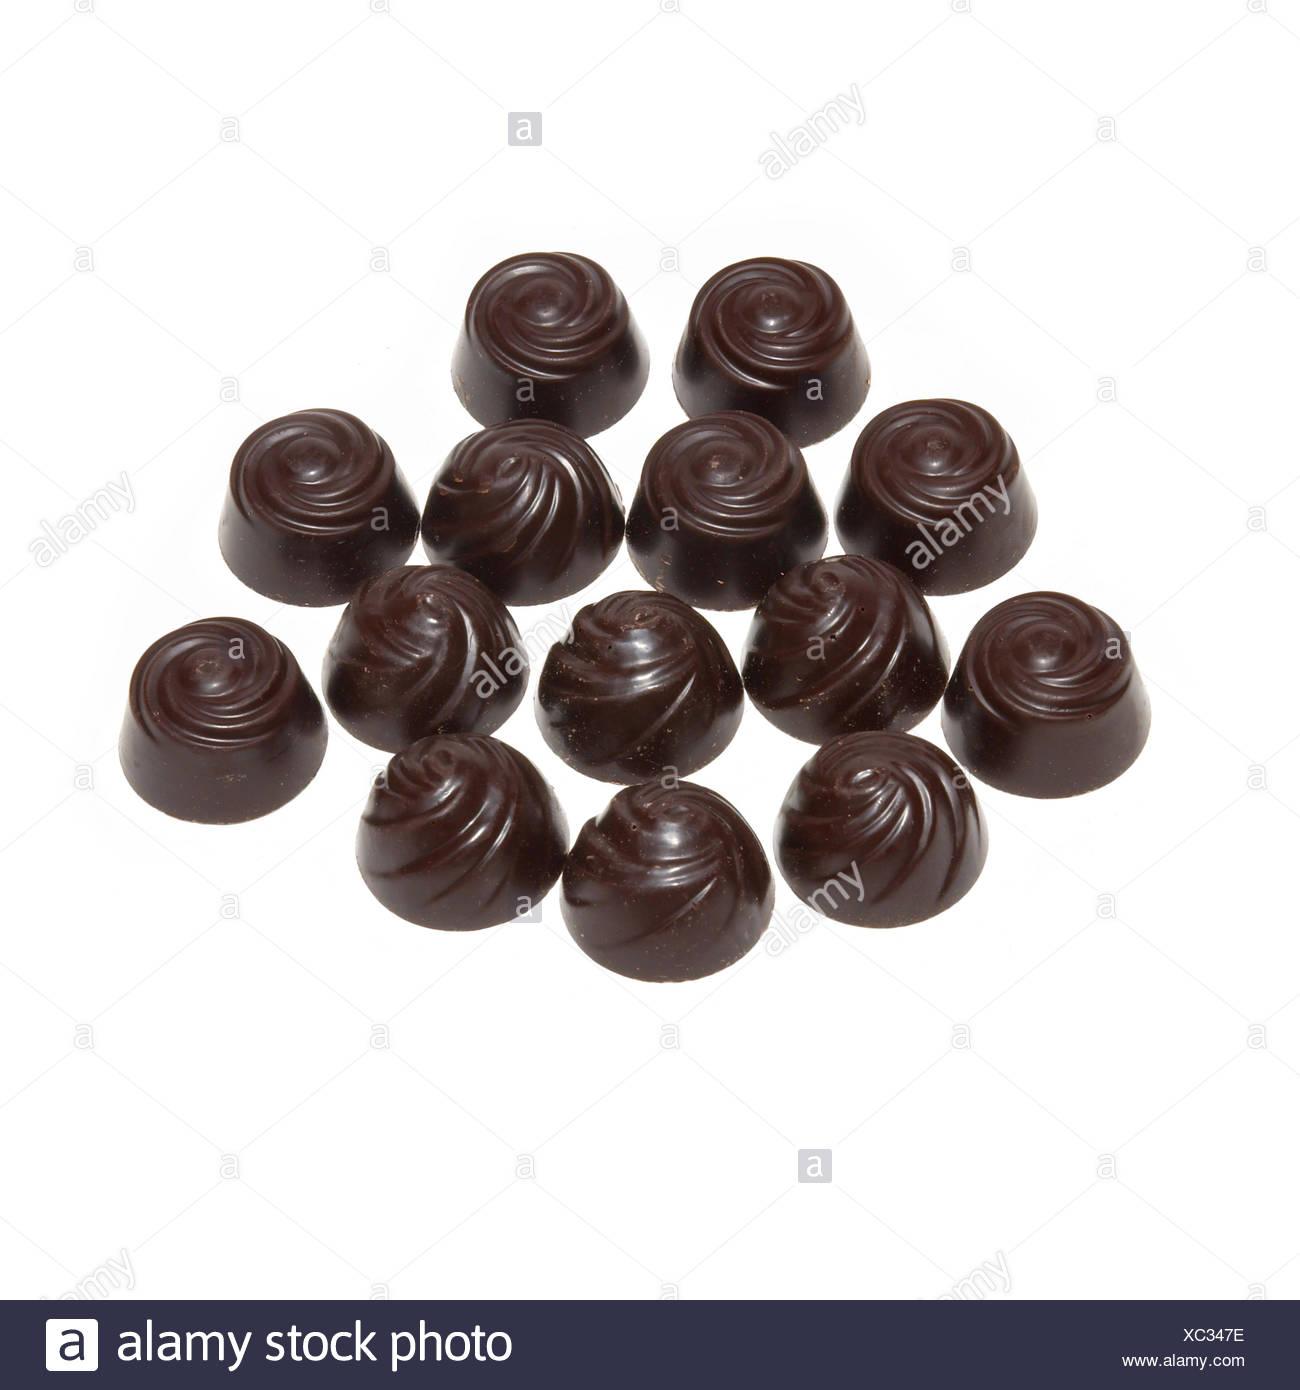 Delicious dark chocolate pralines isolated on white. - Stock Image